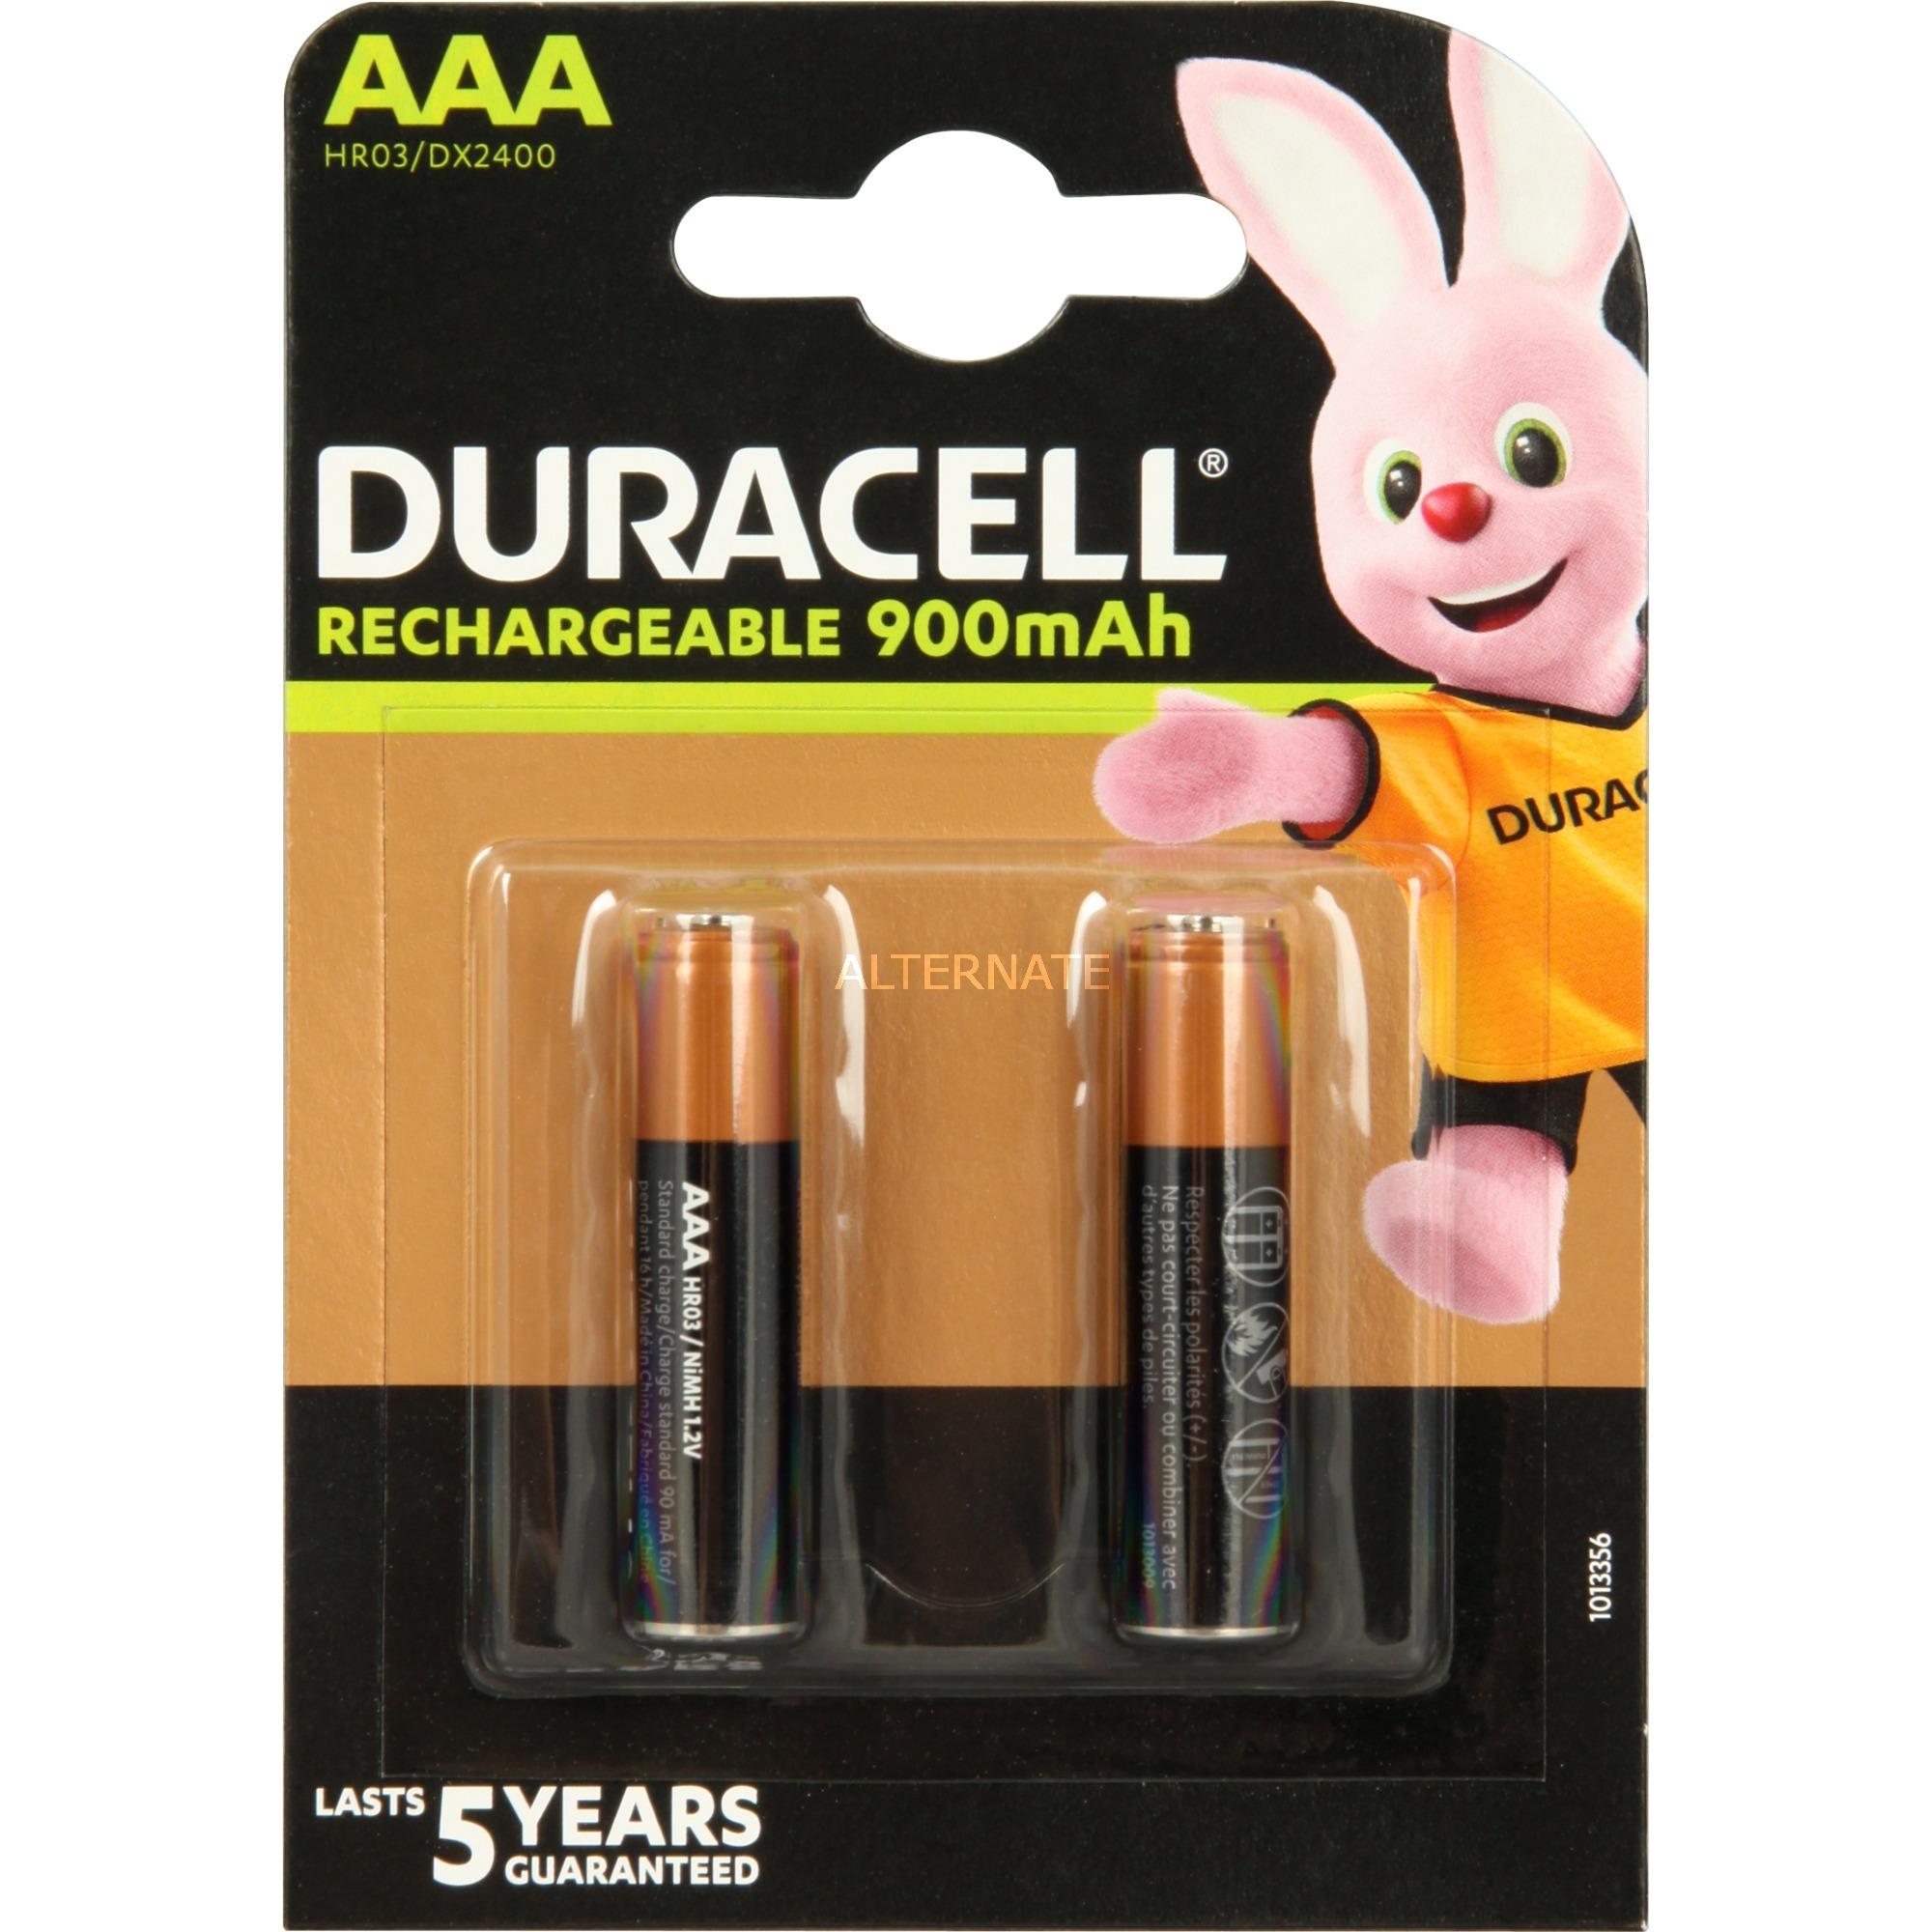 203815 Níquel metal hidruro 800mAh 1.2V batería recargable